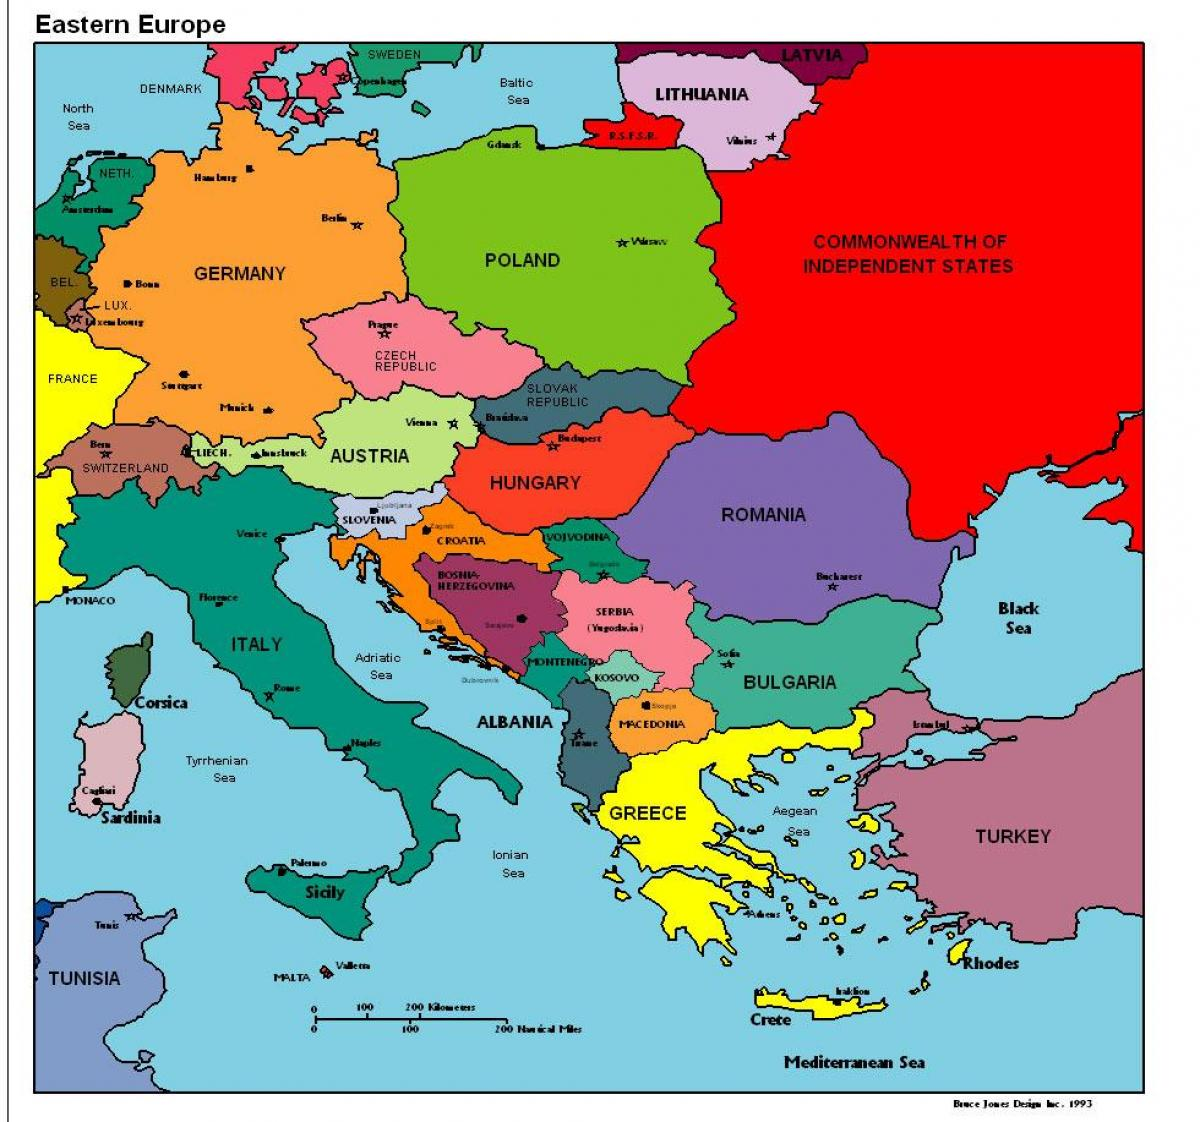 Albaniya Karte Evropy Na Karte Evropy Albaniya Yuzhnaya Evropa Evropa